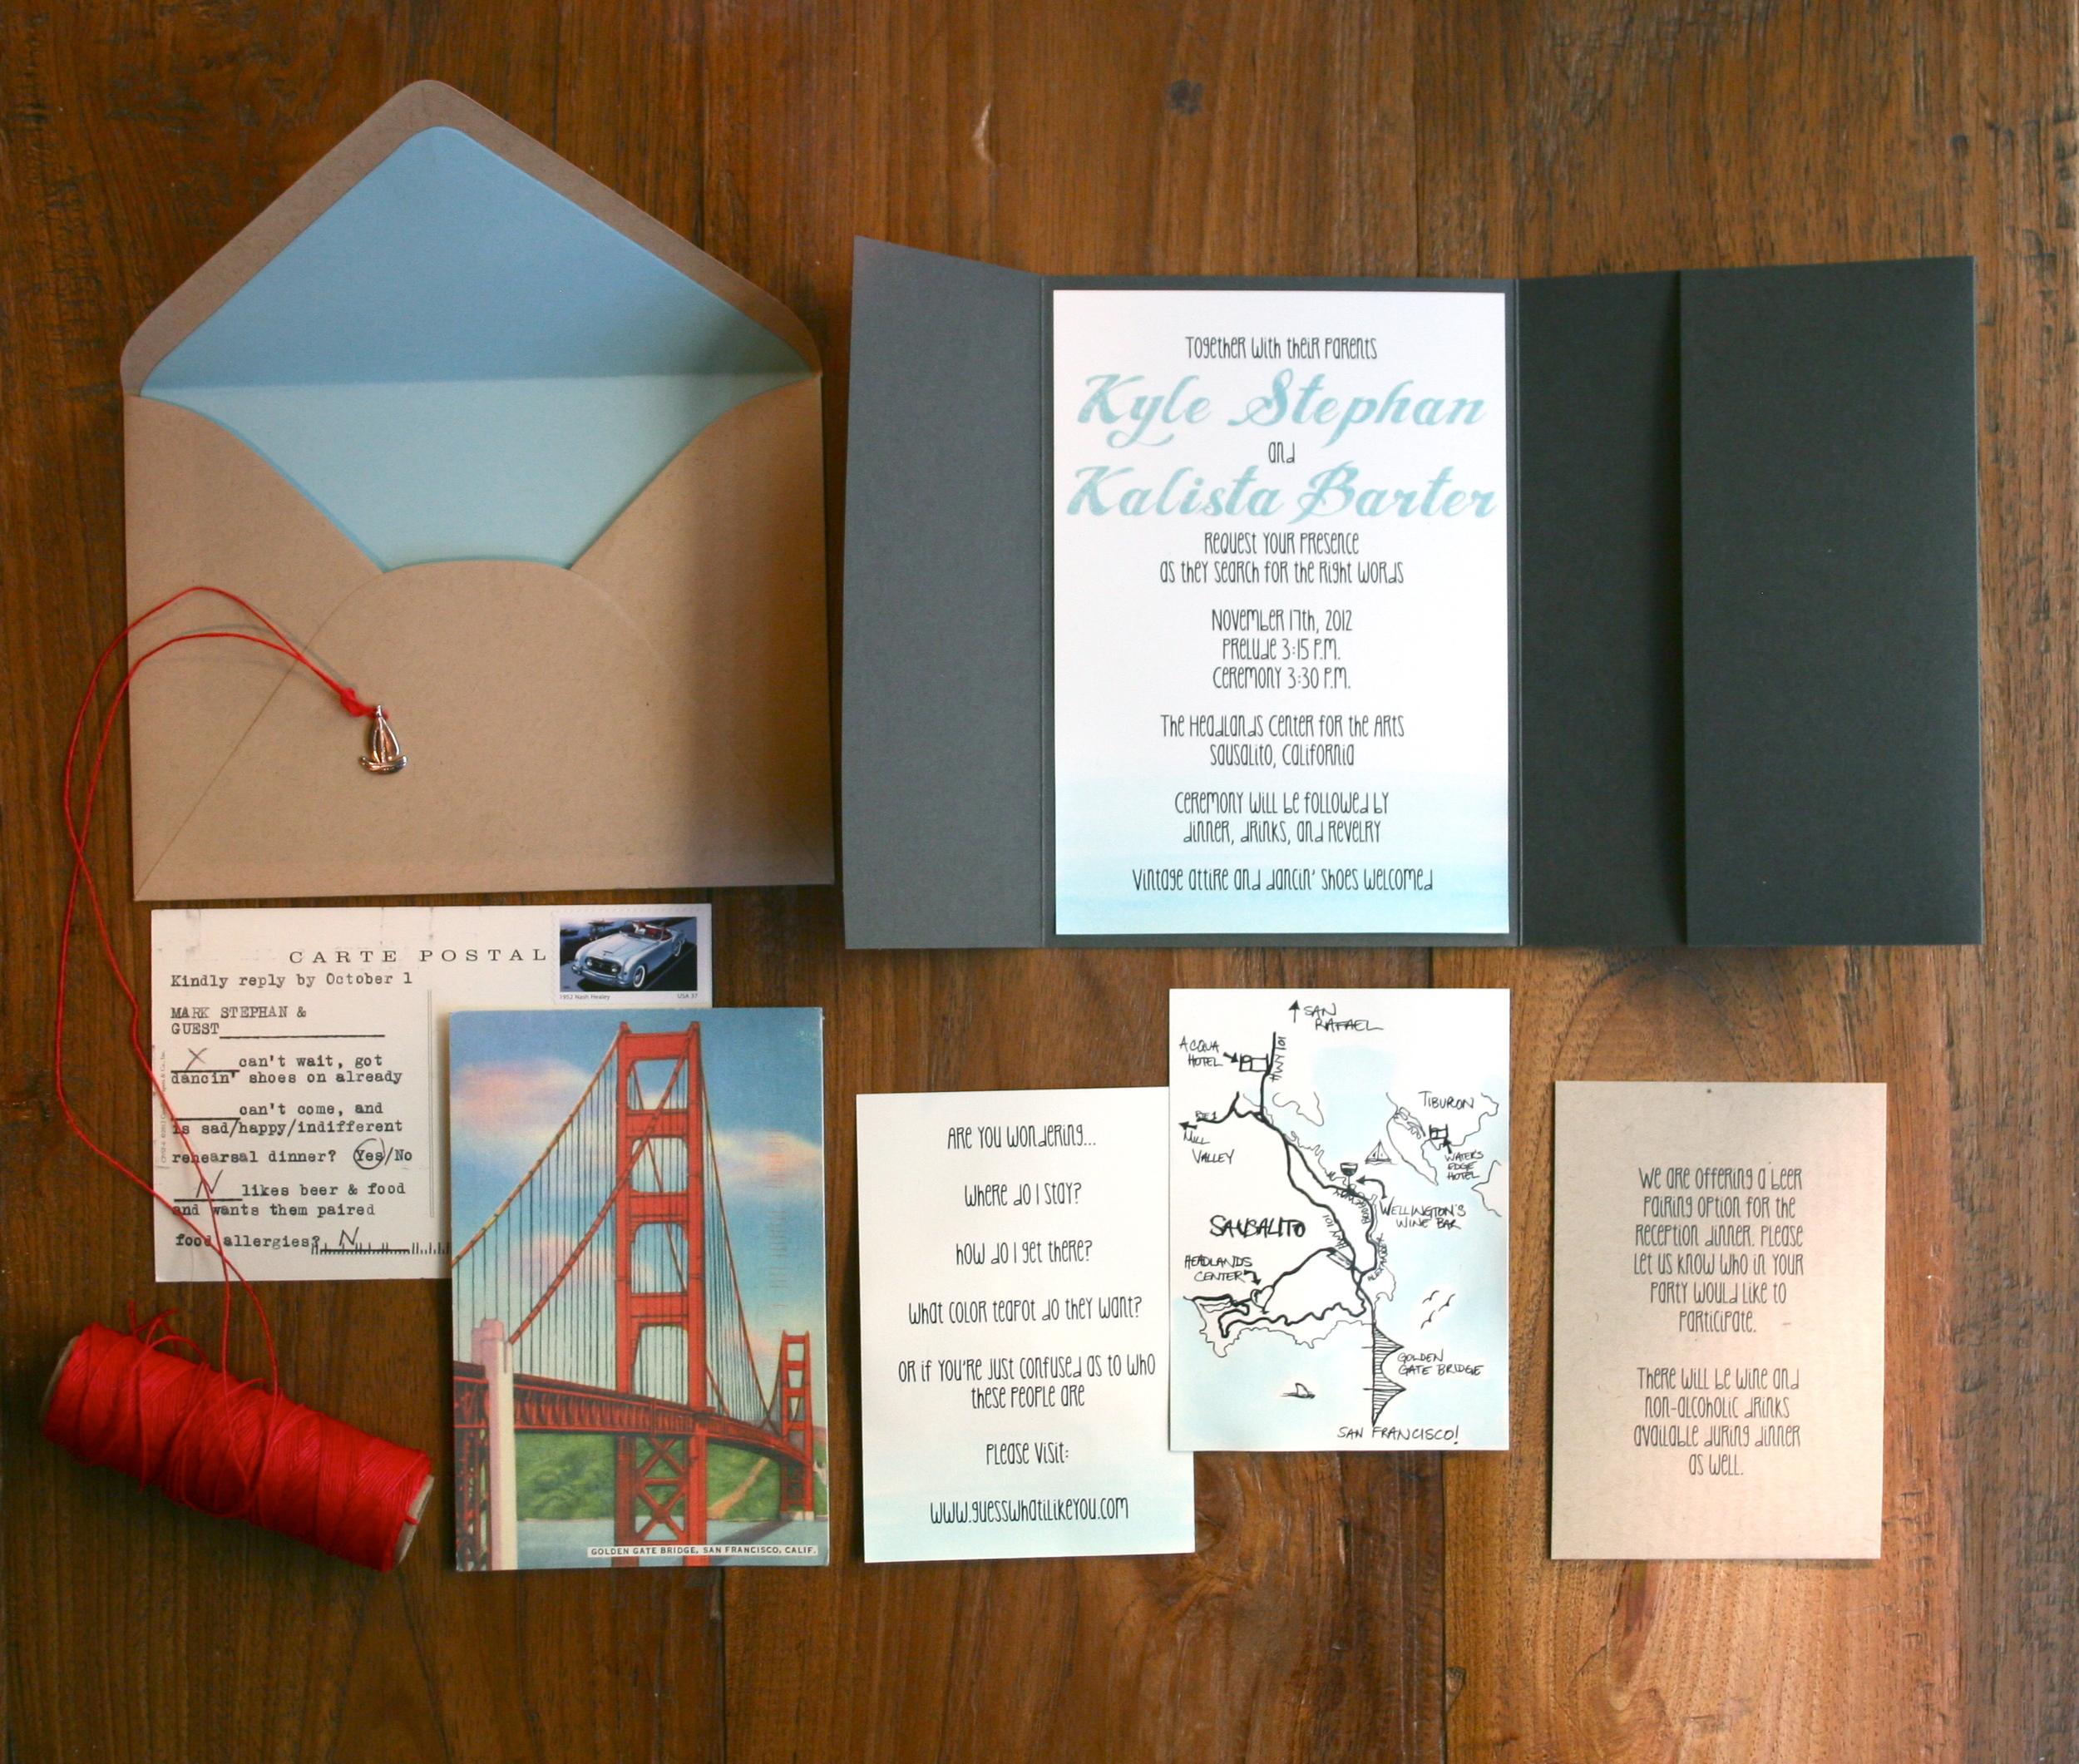 diy invitations revealed   engaged & inspired wedding planning, Wedding invitations